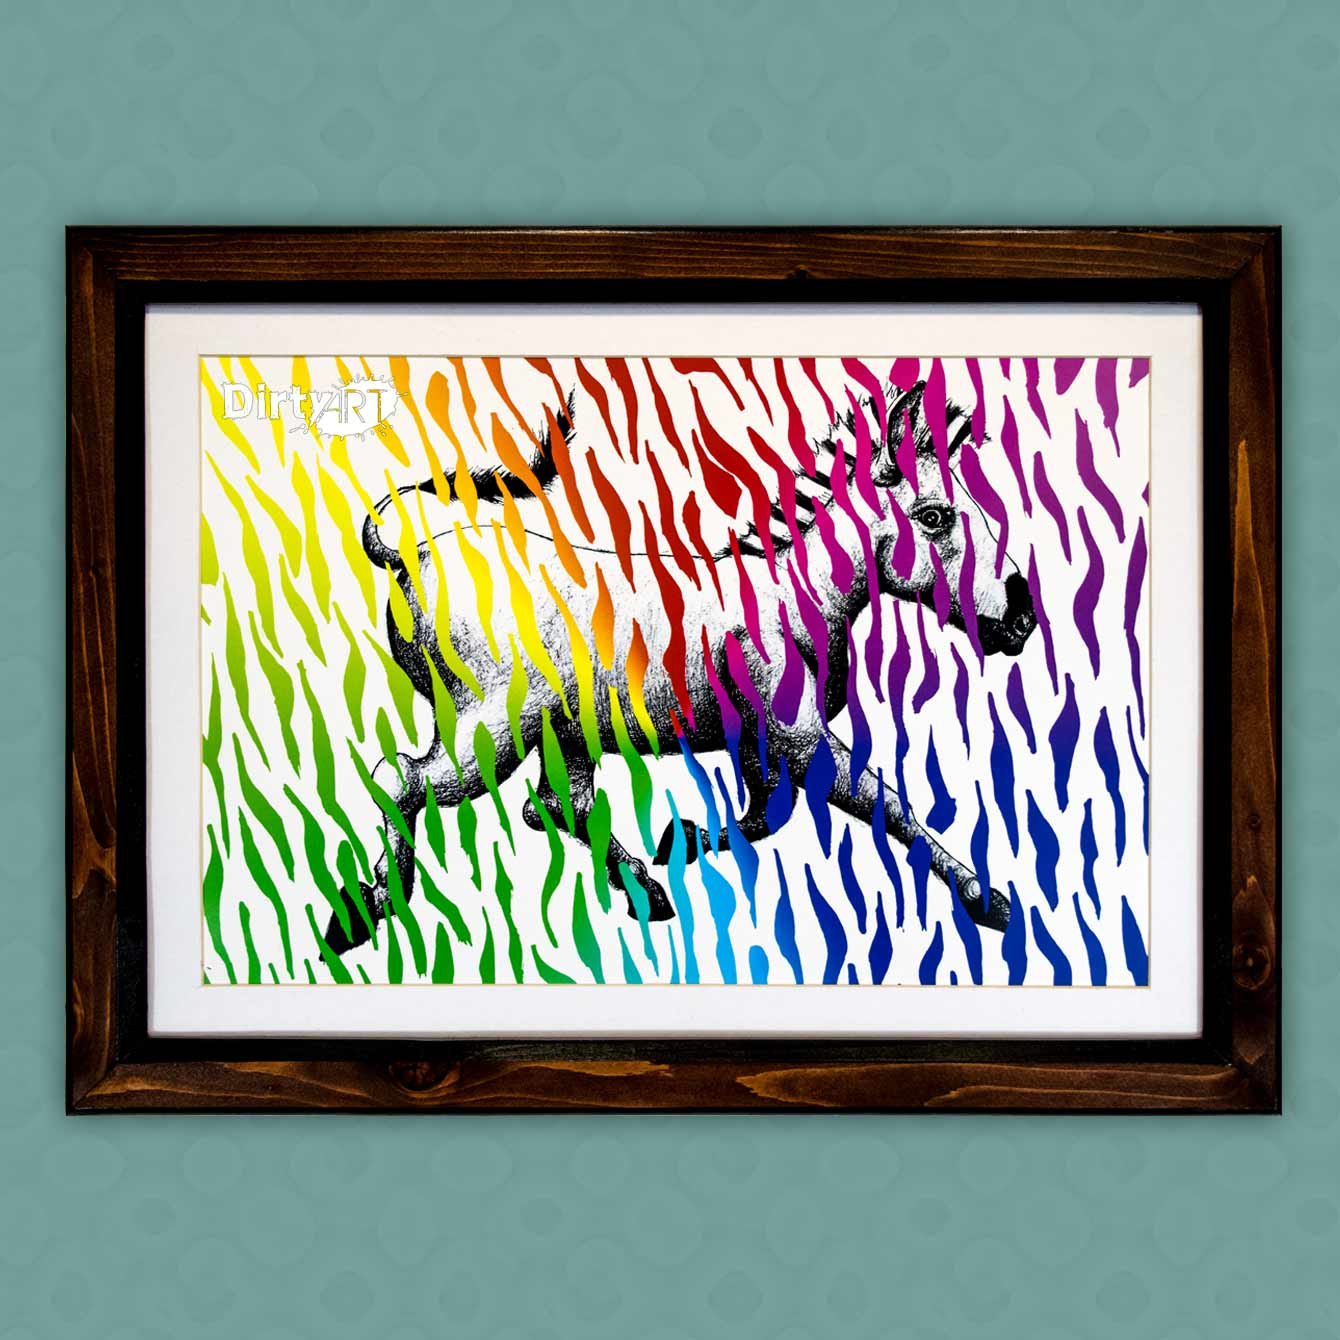 Shop-frame-rnbw-Zebra.jpg